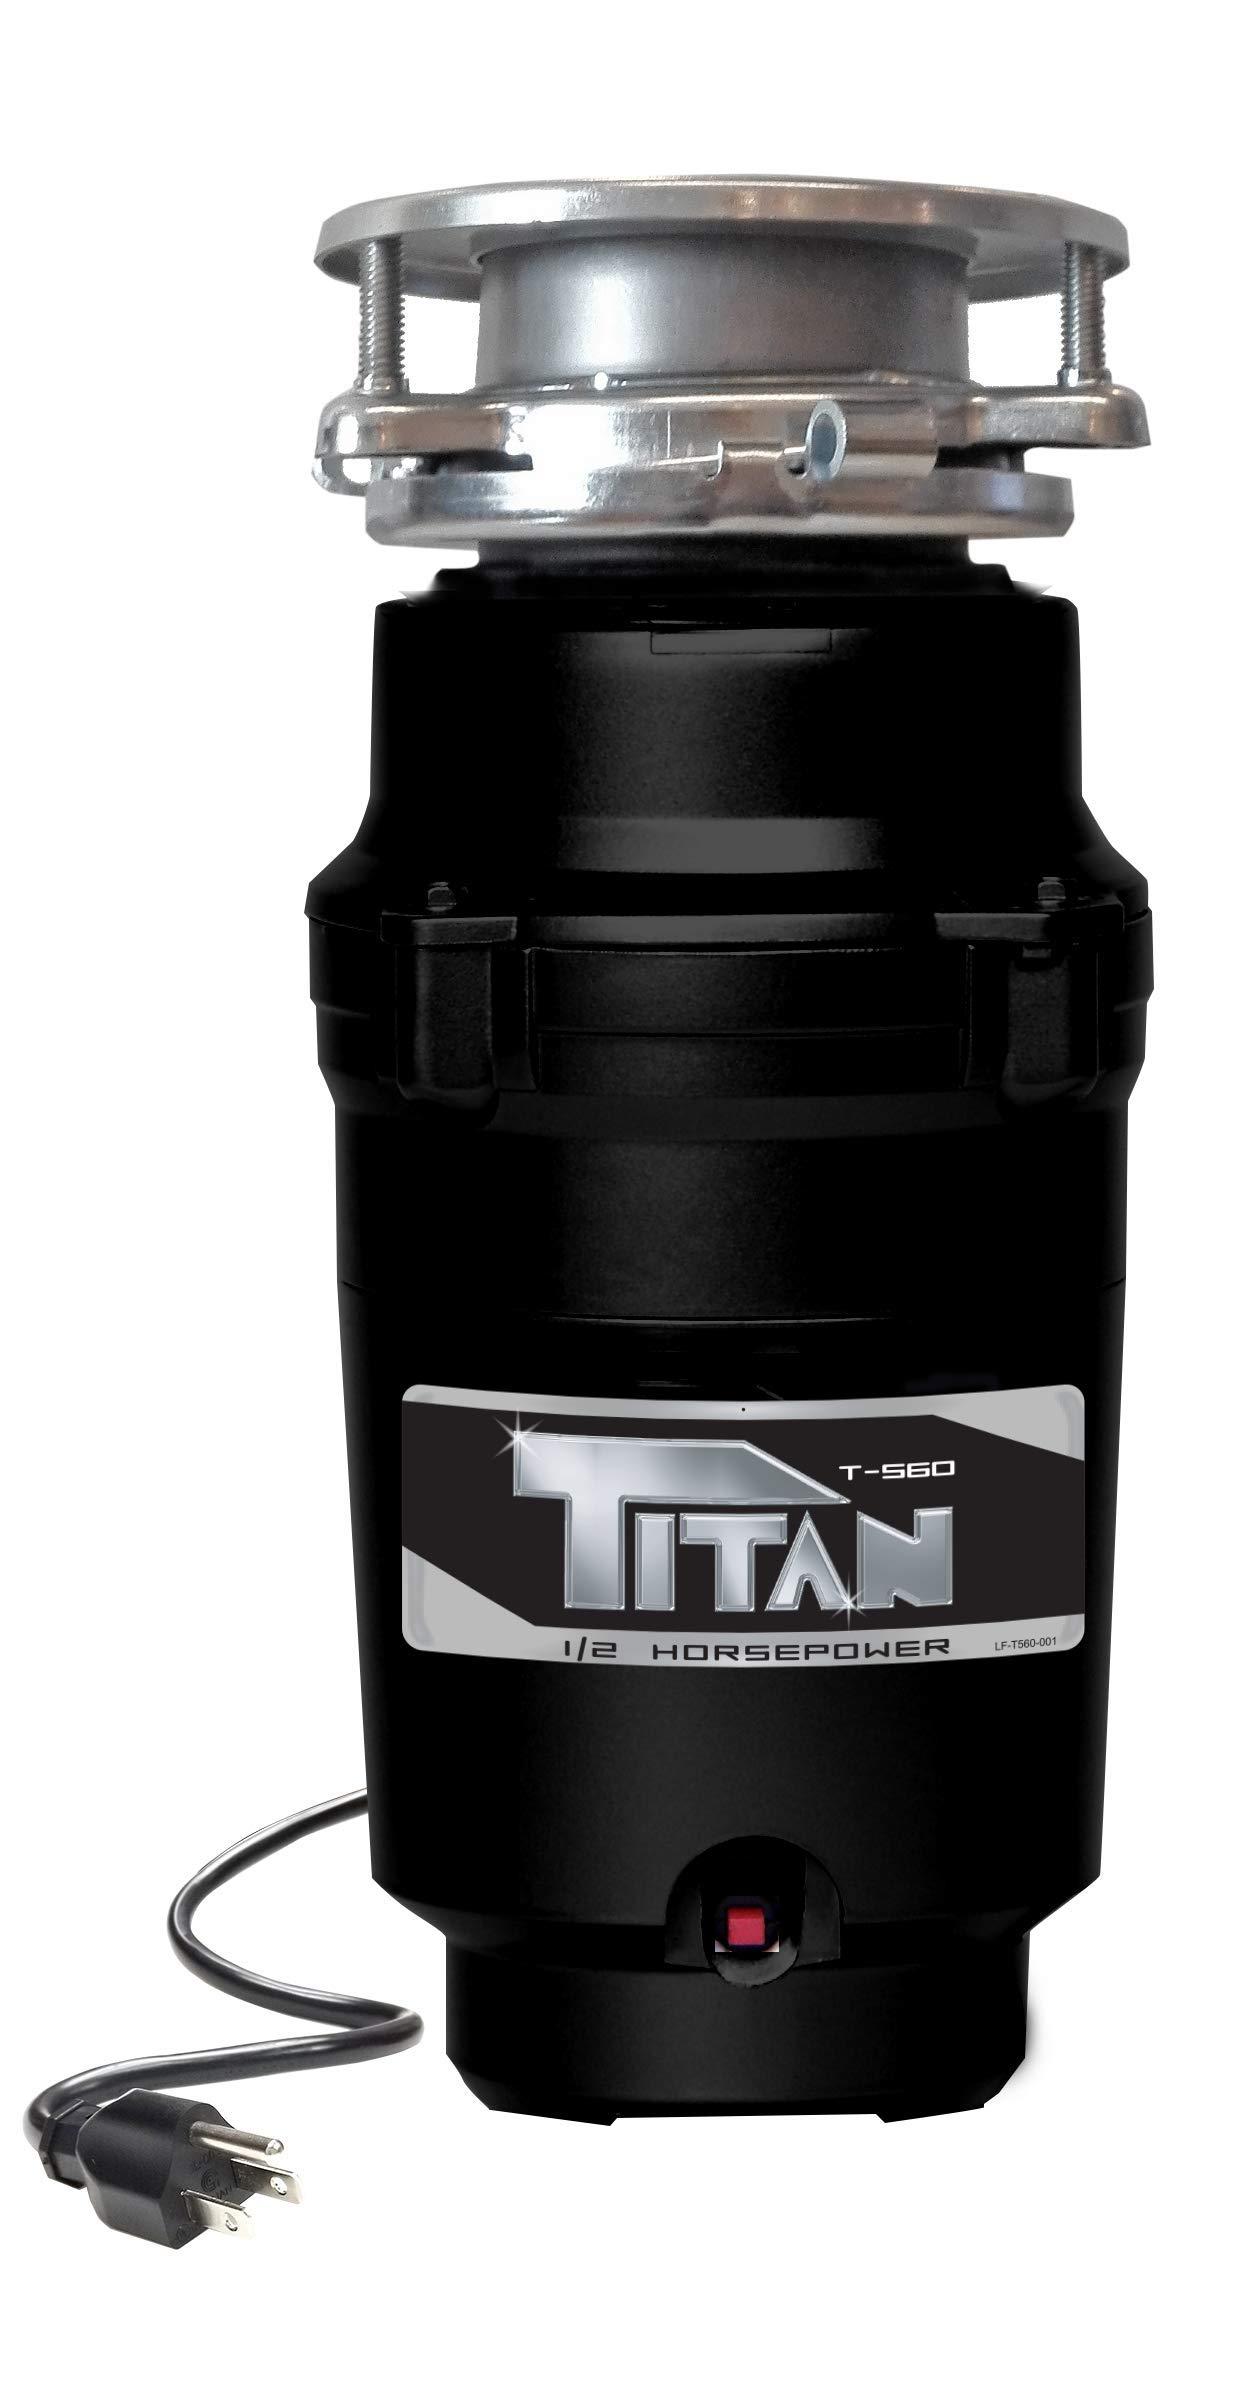 Titan T-560 Garbage Disposal, 1/2 HP - Economy, black by Titan